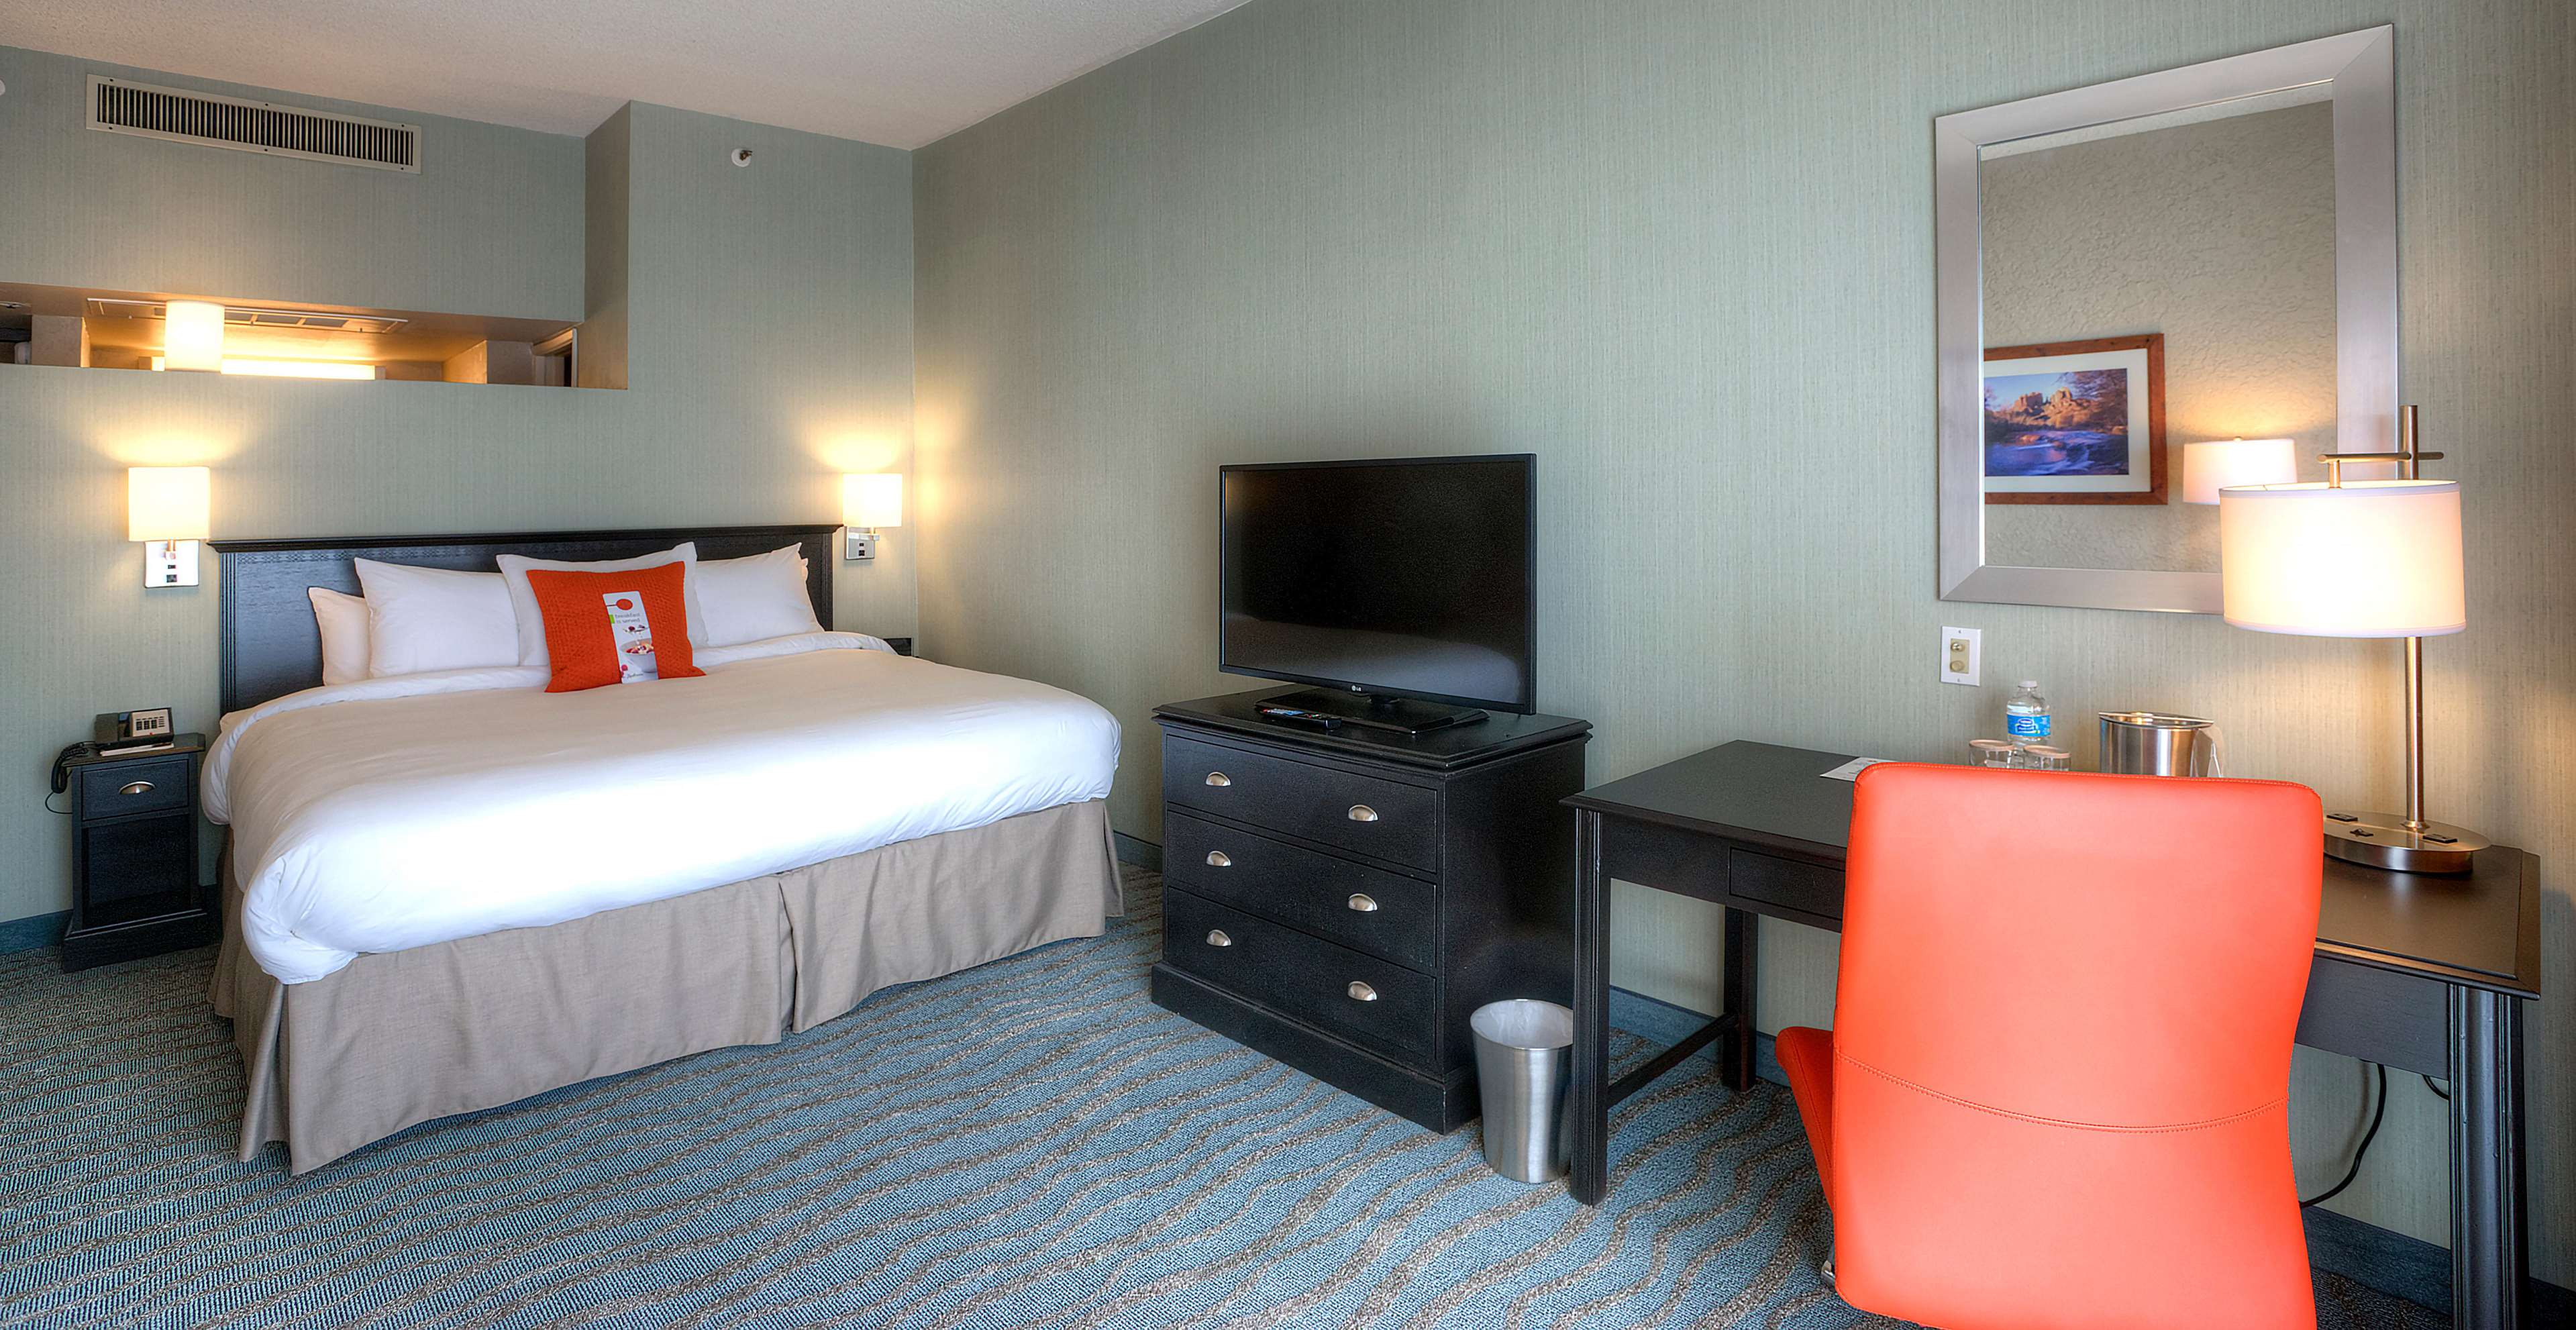 DoubleTree by Hilton Phoenix North image 23